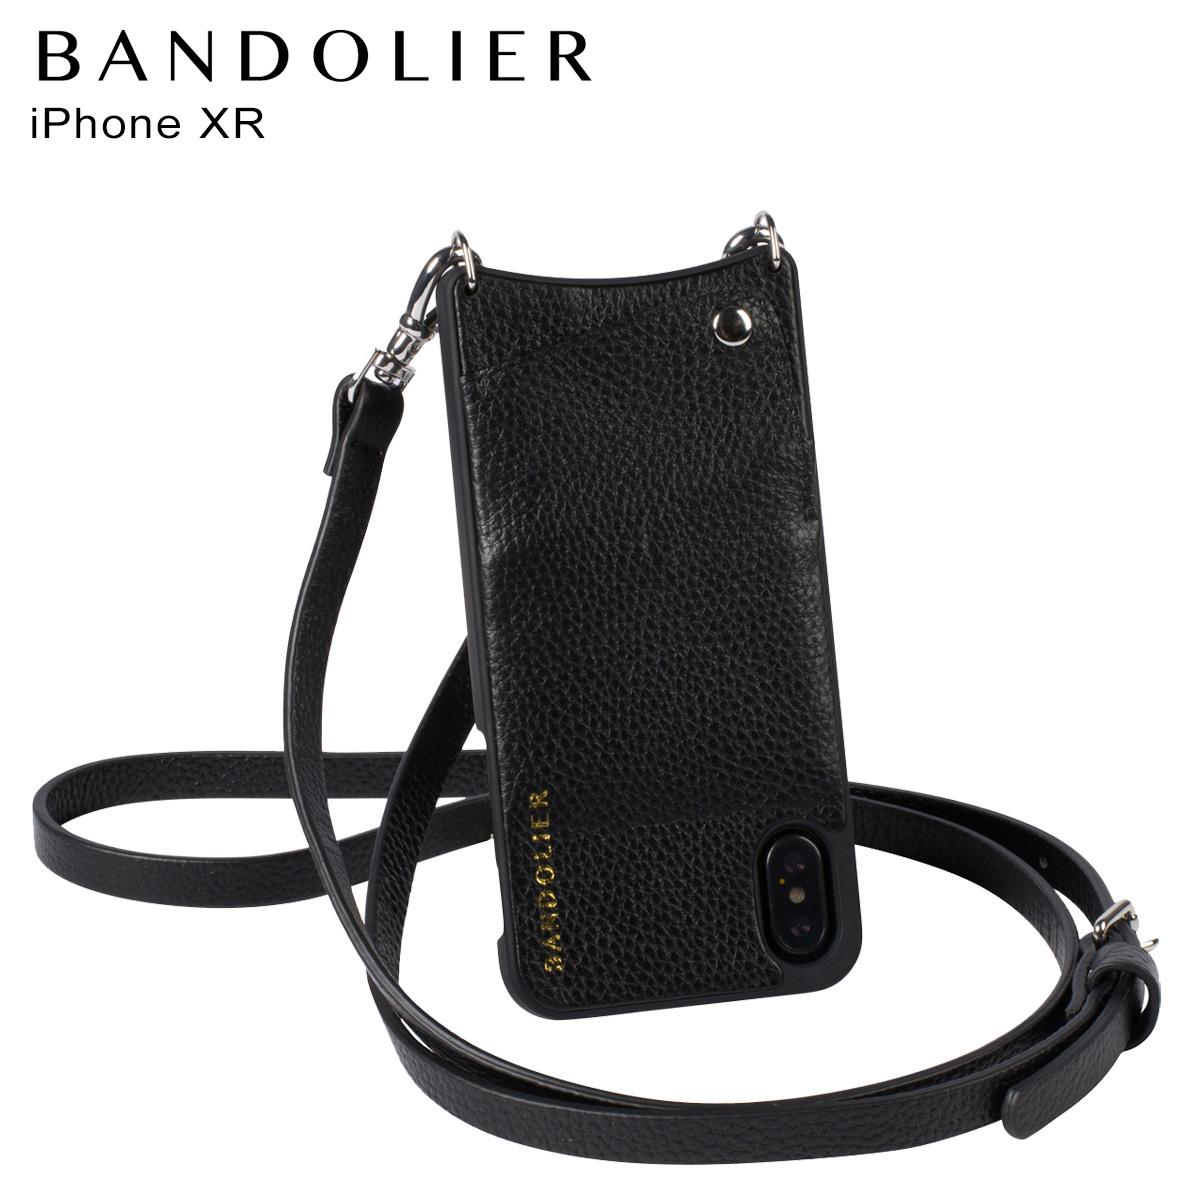 BANDOLIER バンドリヤー iPhone XR ケース ショルダー スマホ アイフォン レザー EMMA SILVER メンズ レディース ブラック 10EMM1001 [4/18 再入荷]